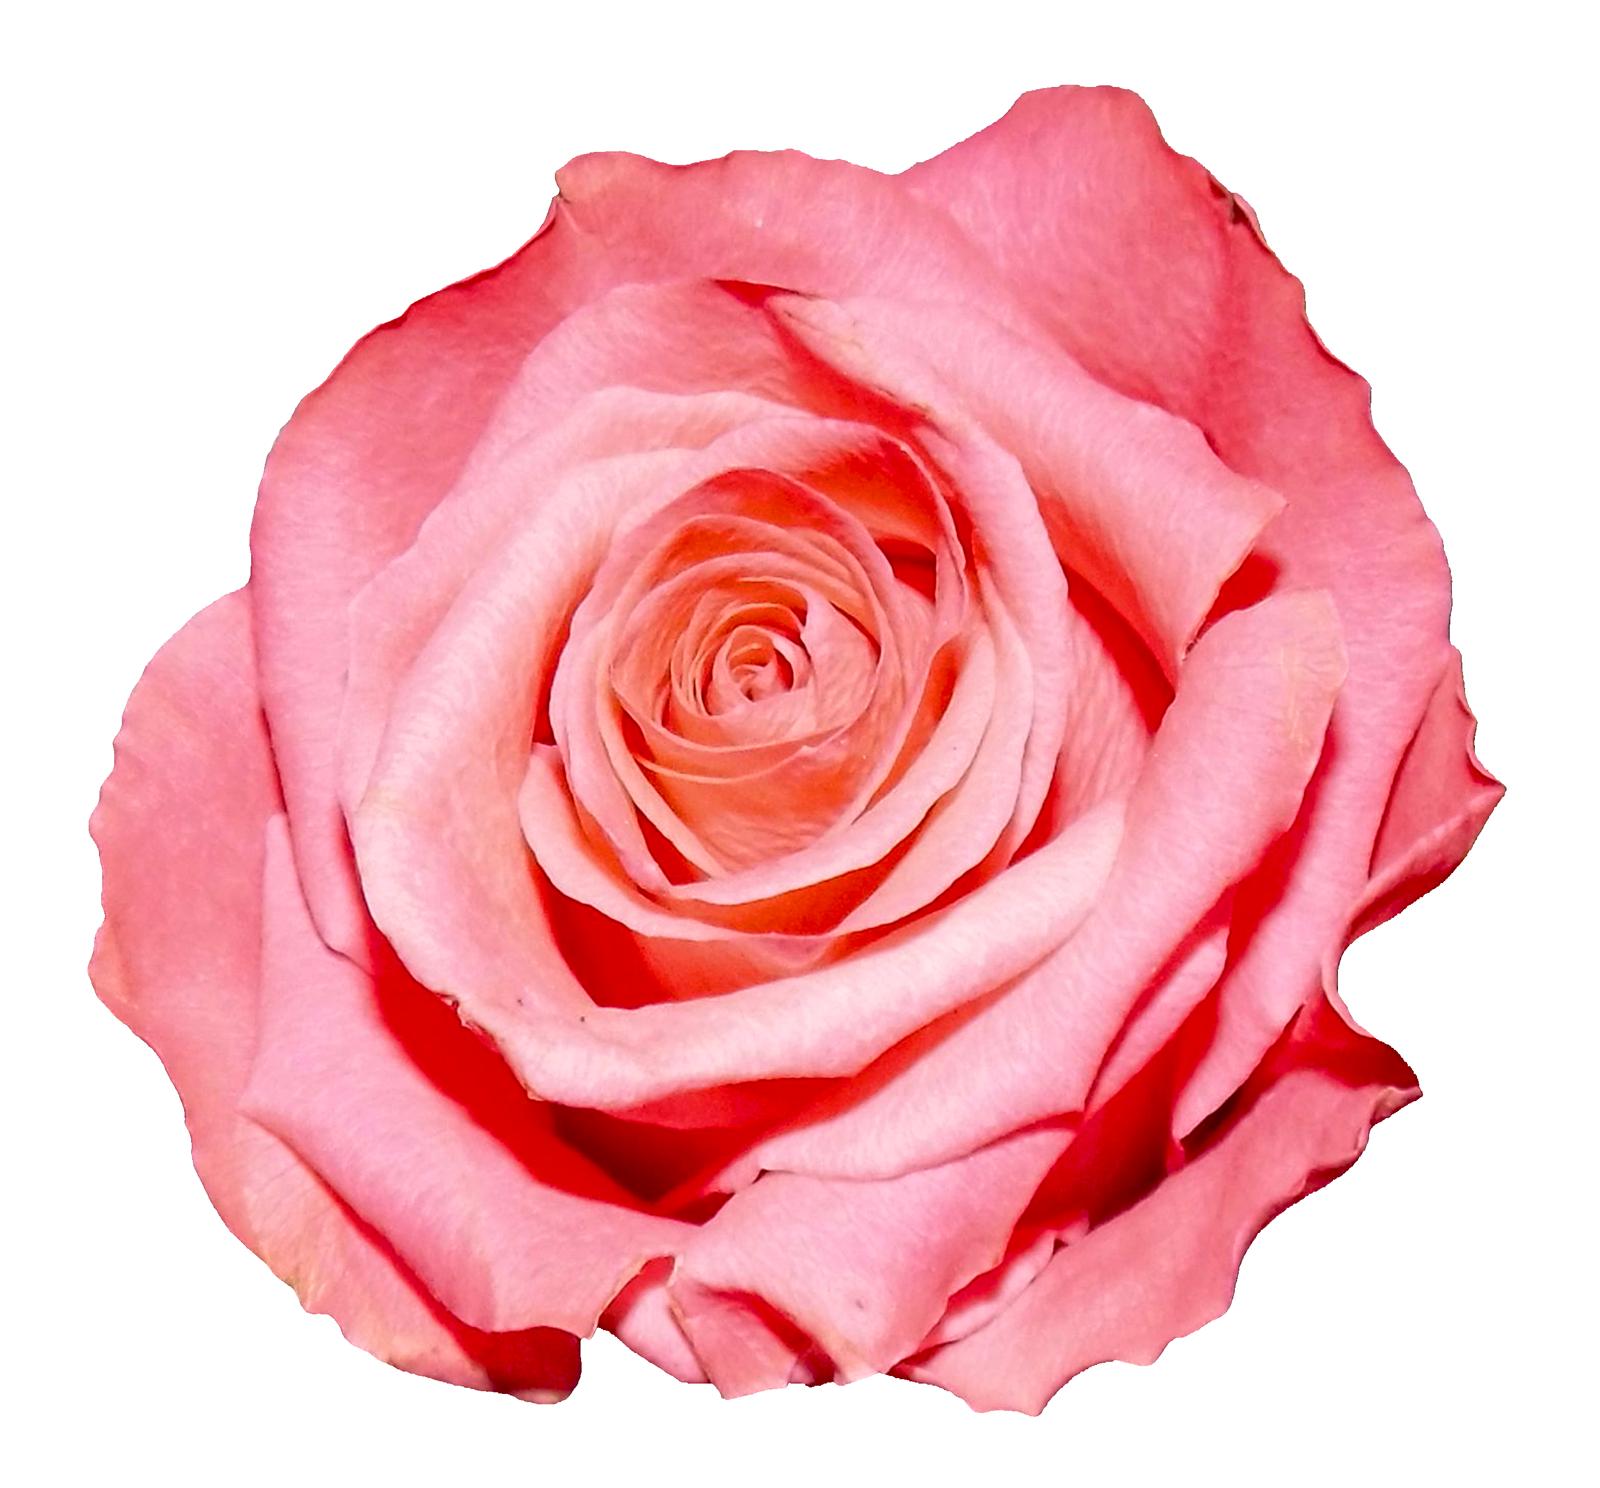 Rose PNG Image - Rose PNG